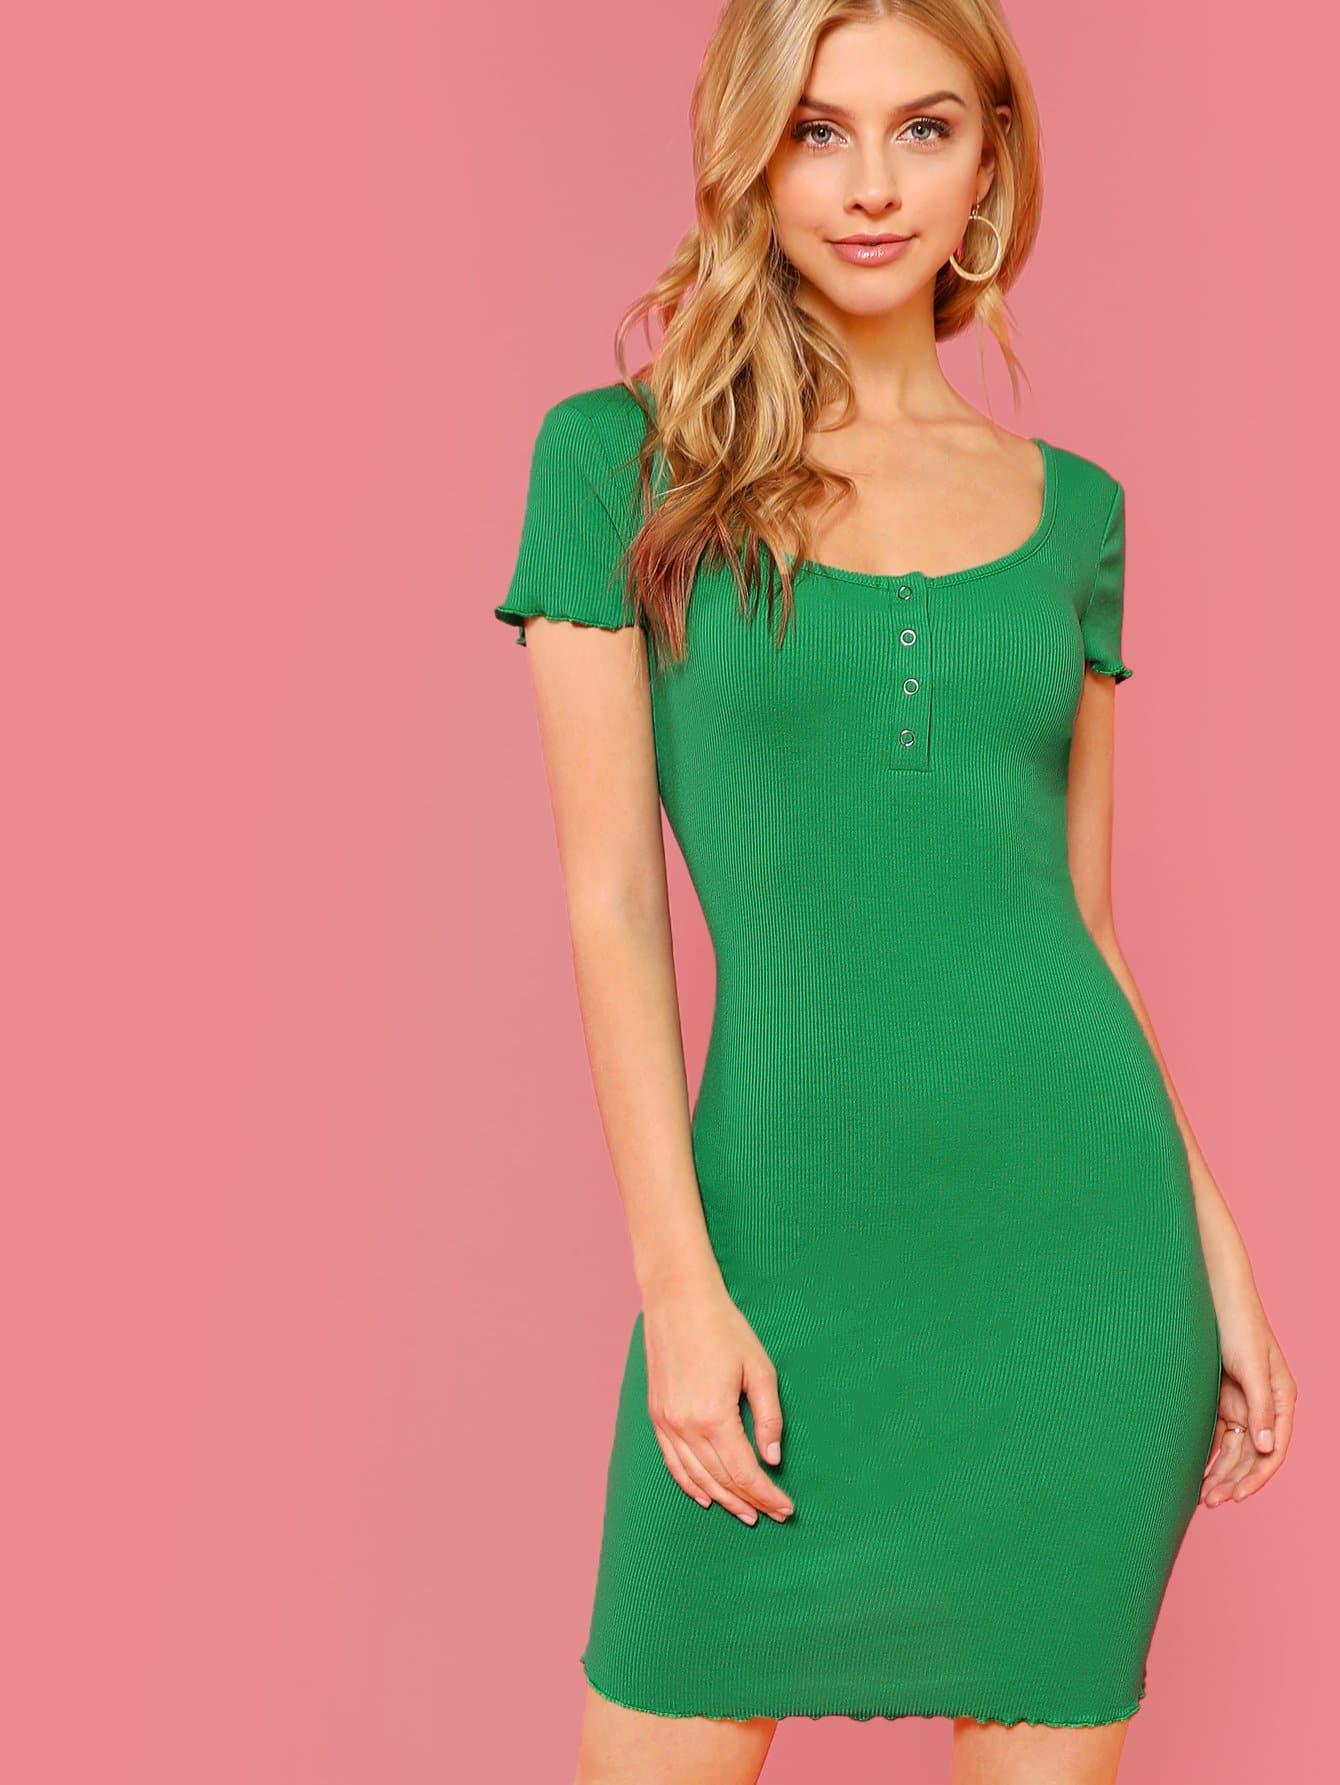 Button Front Lettuce Trim Rib Knit Dress button front rib knit top